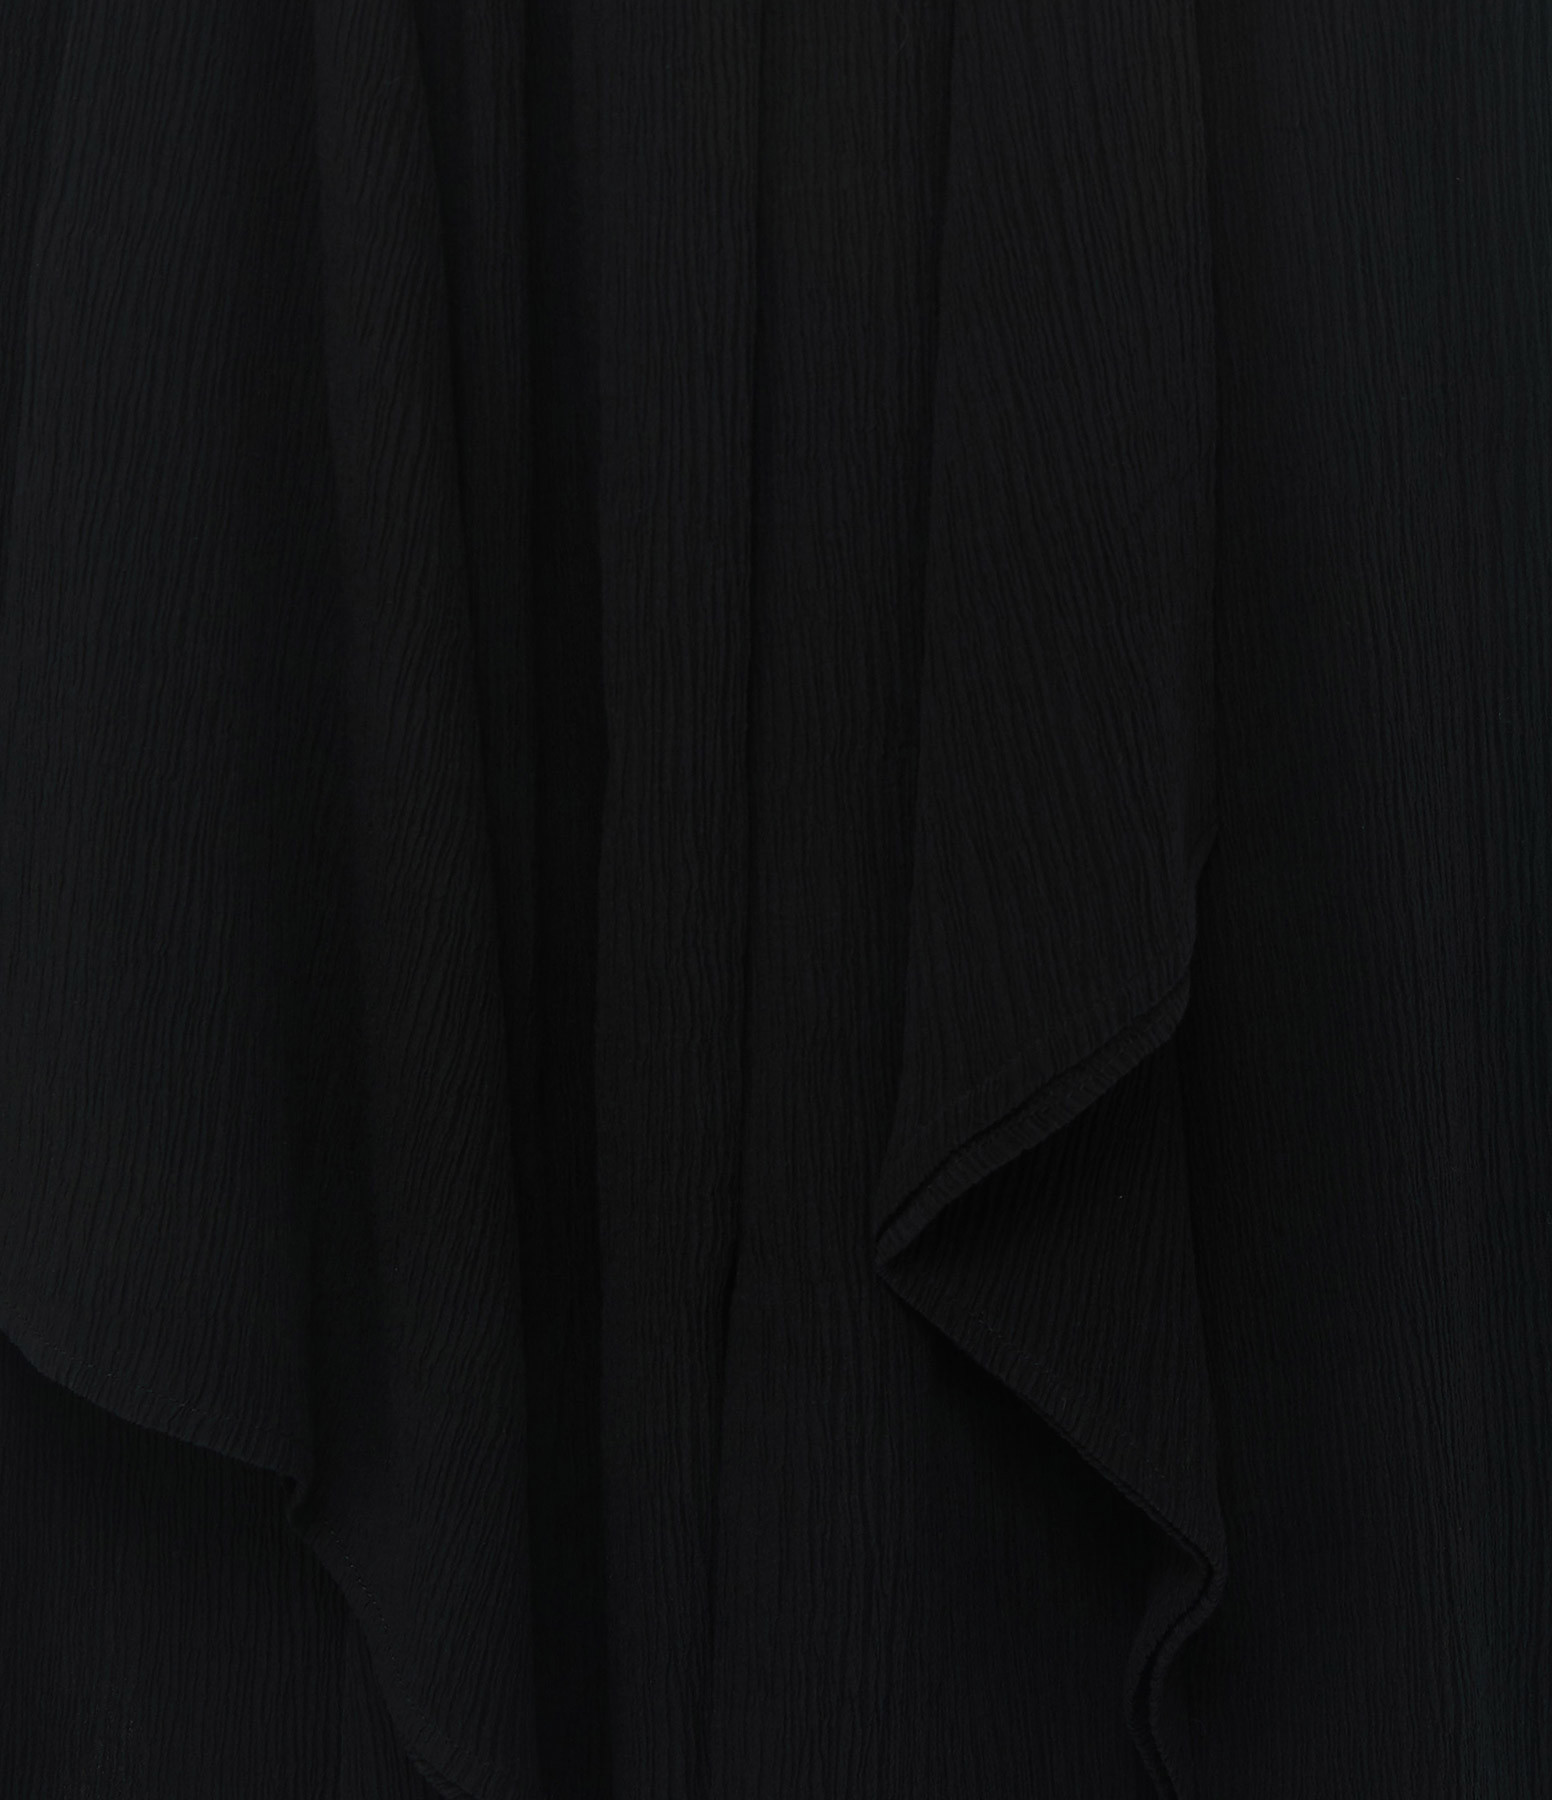 ISABEL MARANT - Jupe Darnae Coton Soie Noir